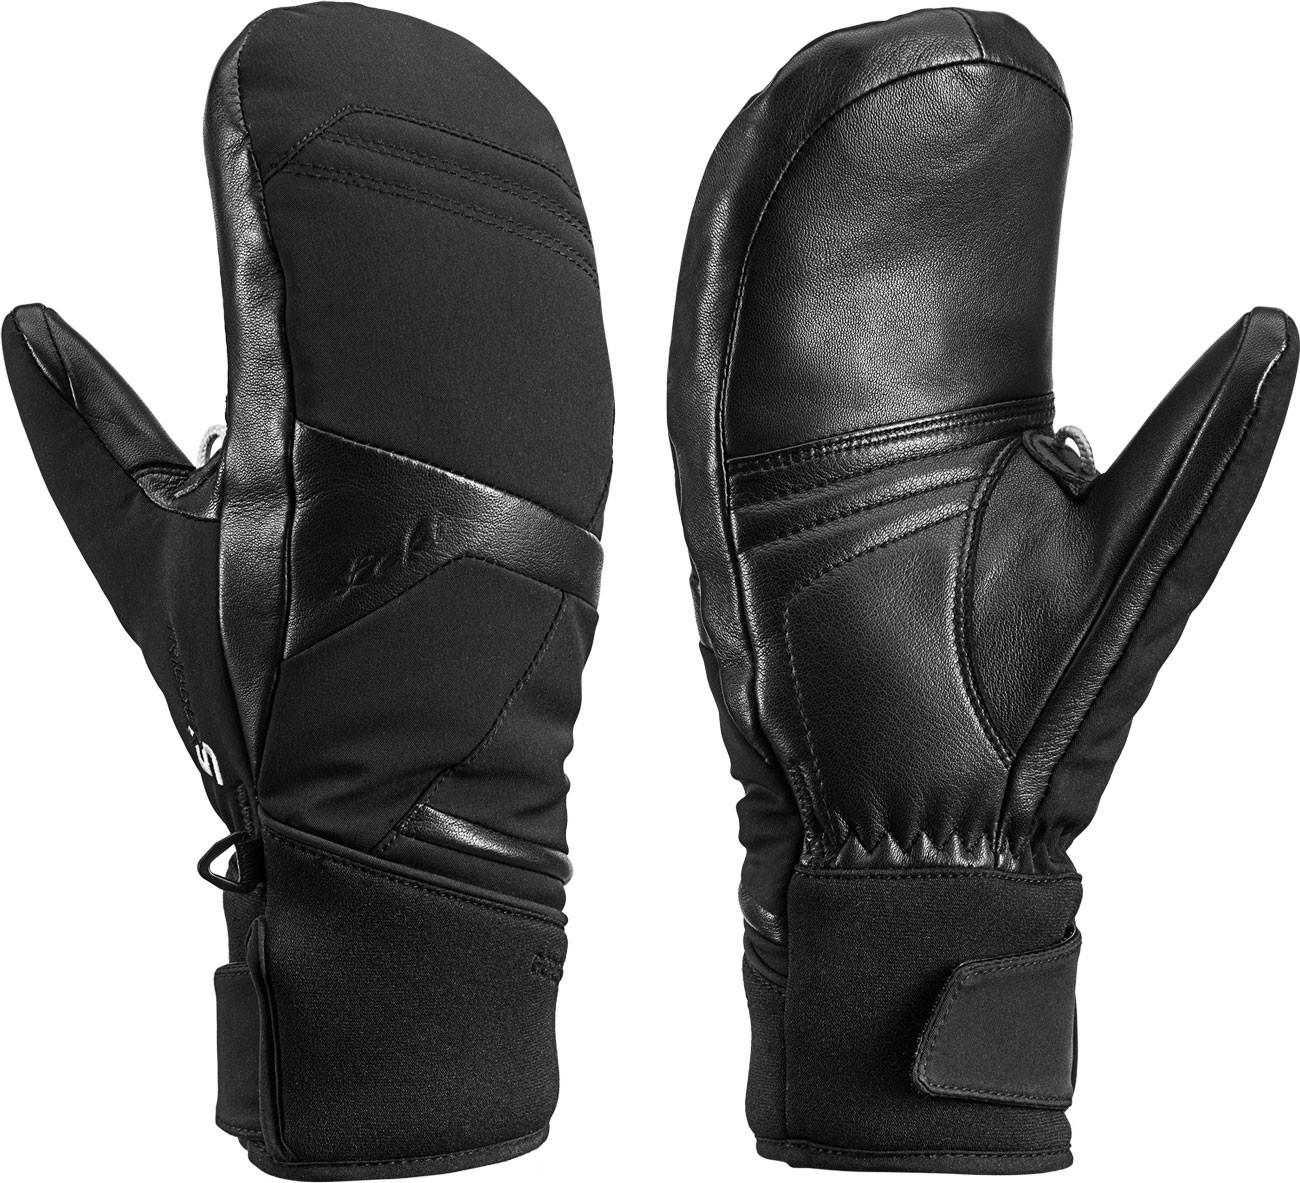 Leki Equip S GTX Lady Mitt - černá Velikost rukavic: 6.5 2019/2020